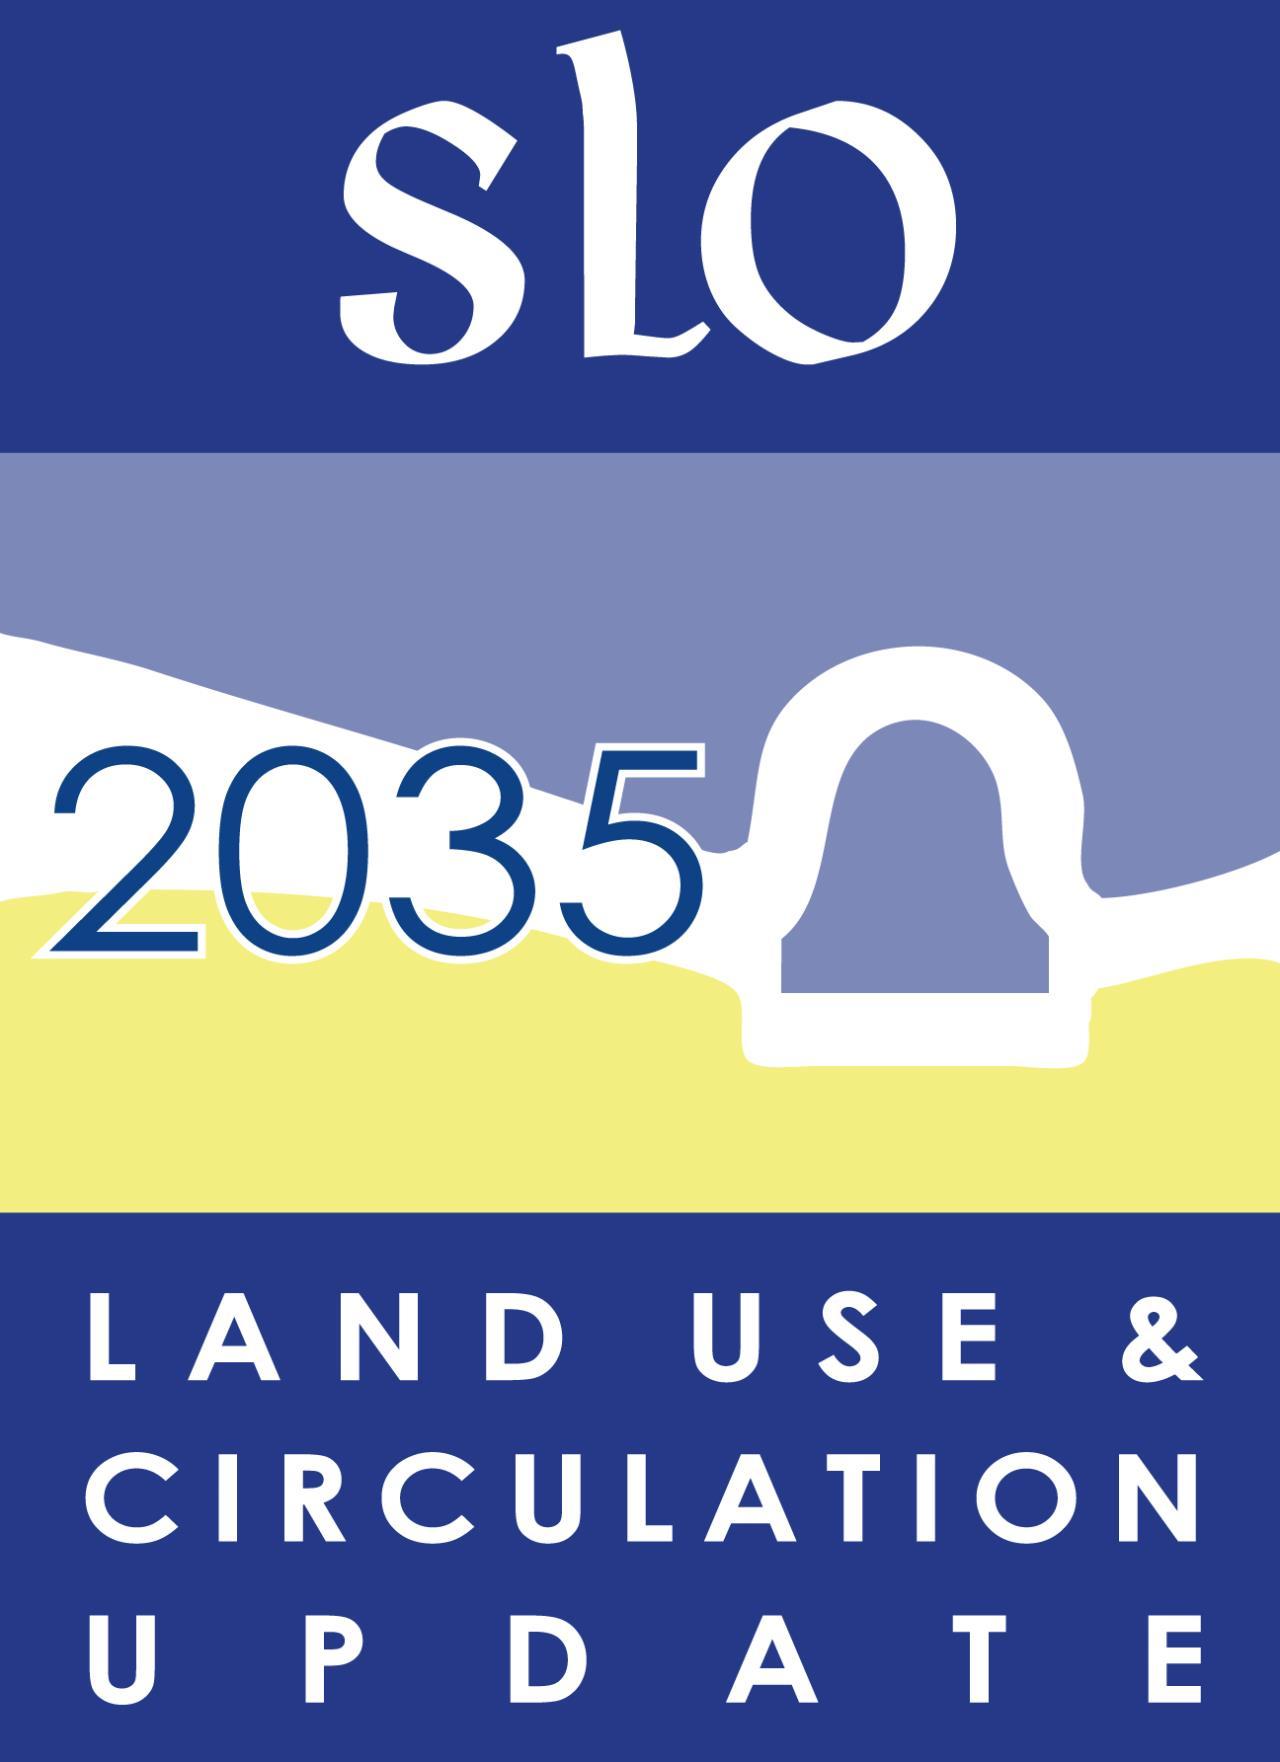 SLO_2035_logo_final